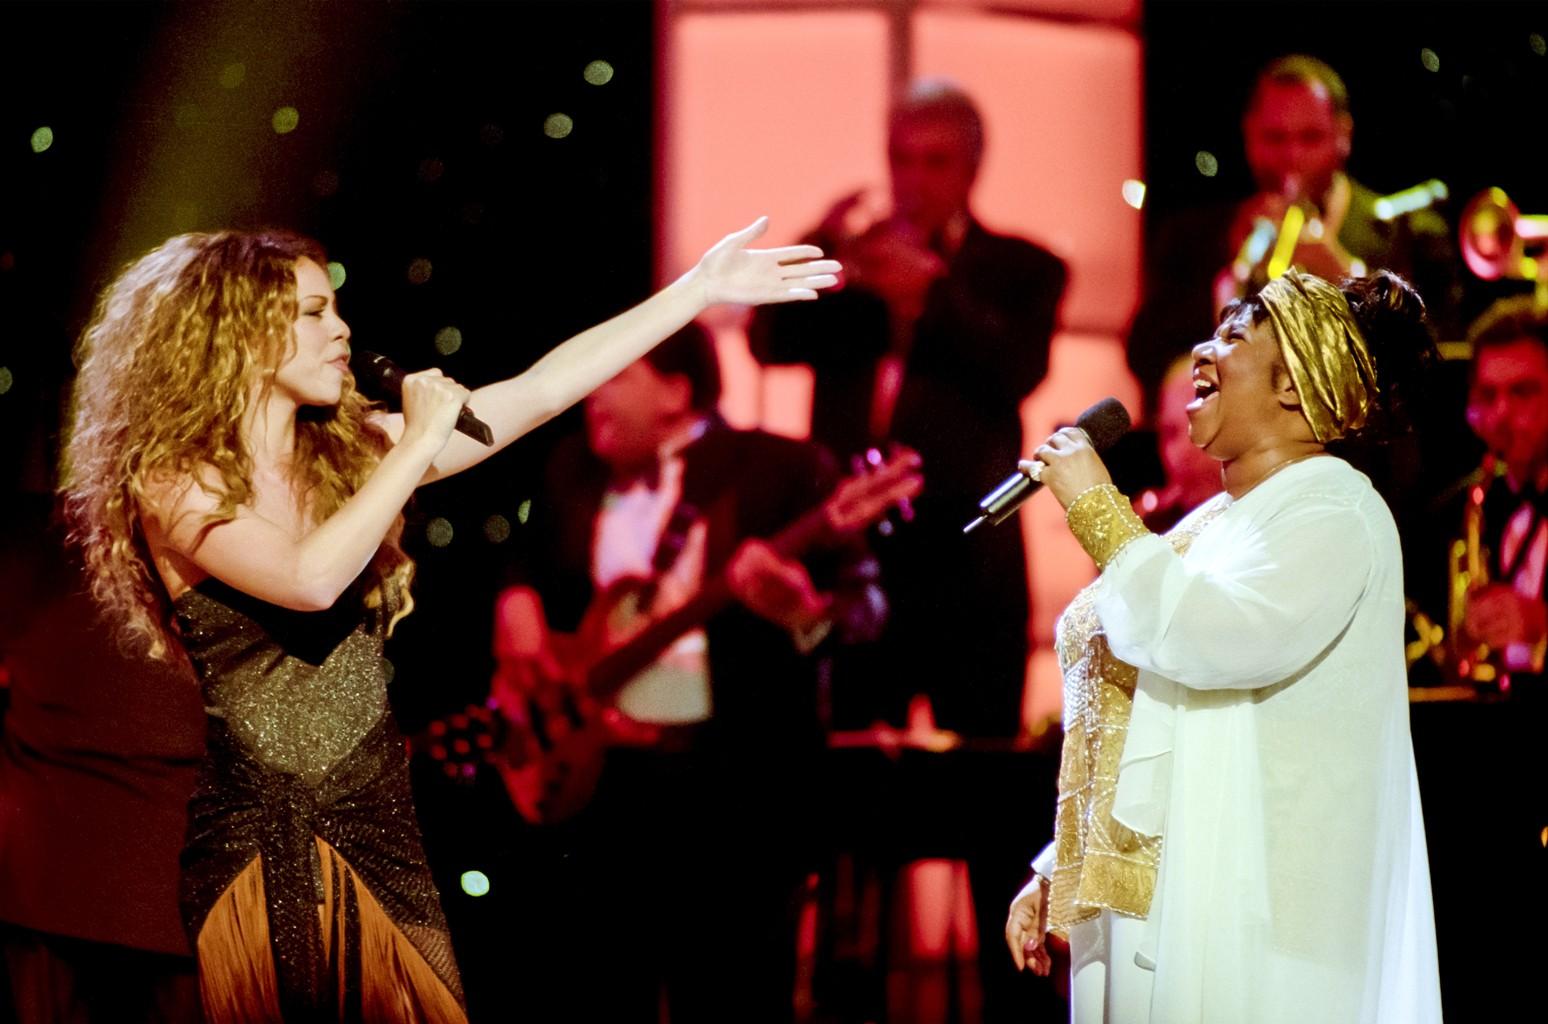 iTunes R&B Sale Sends Otis Redding, Mariah Carey & Aretha Franklin Back Onto Charts